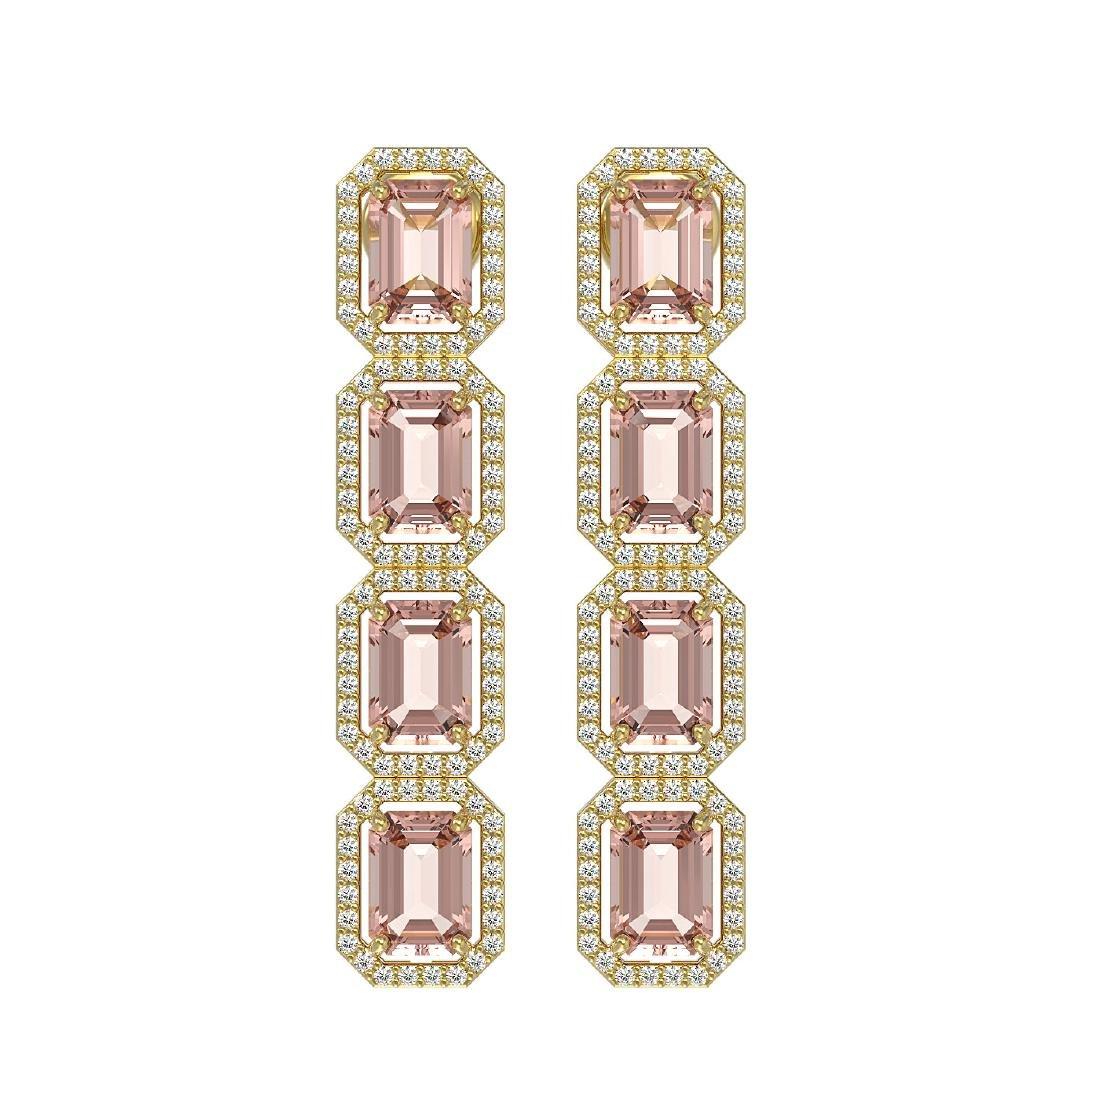 10.73 CTW Morganite & Diamond Halo Earrings 10K Yellow